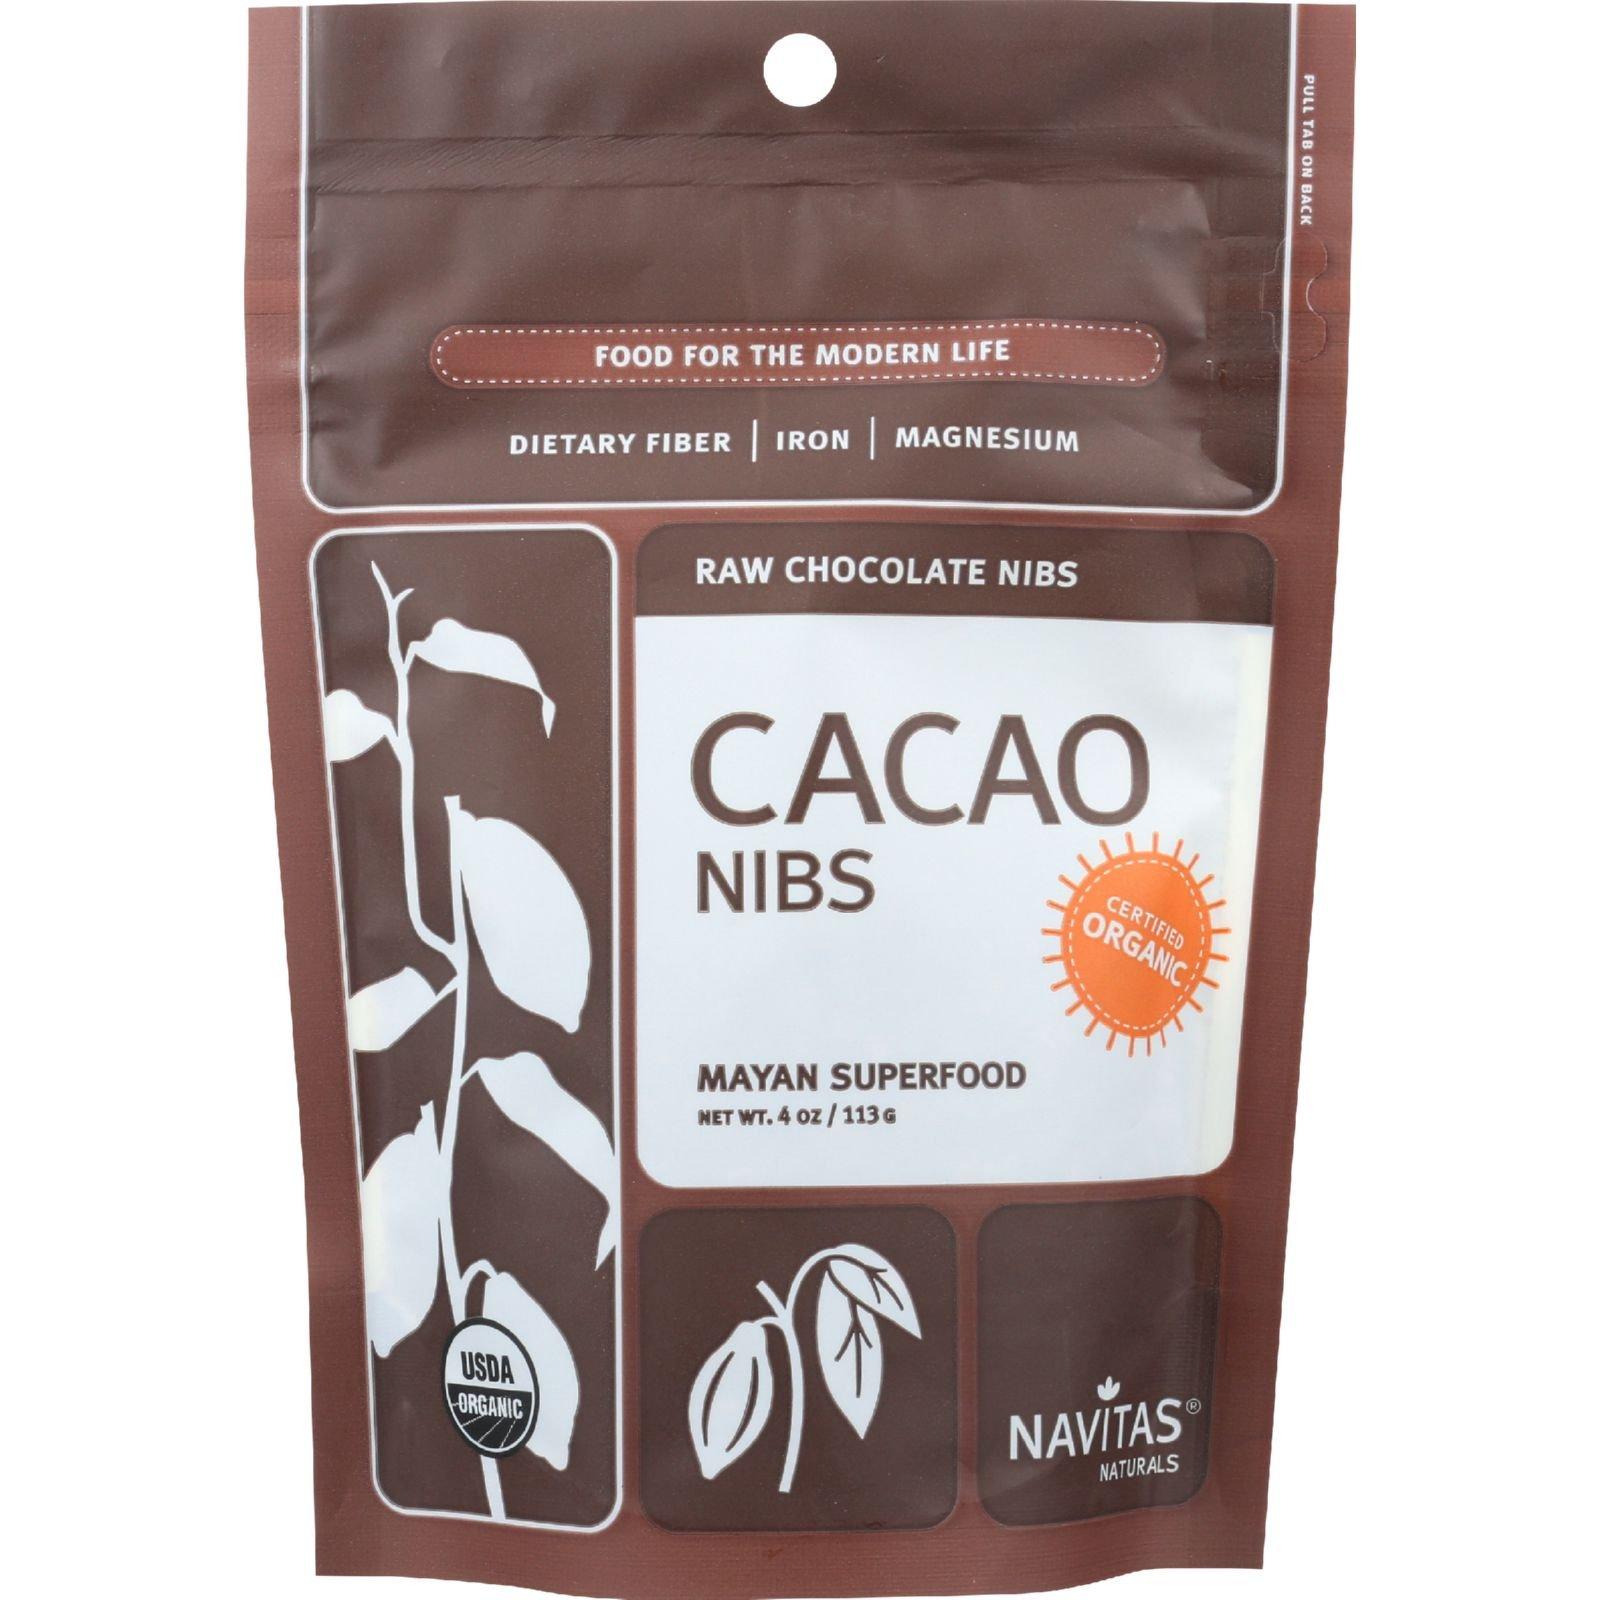 Navitas Naturals Cacao Nibs - Organic - Raw - 4 oz - case of 12 - 100% Organic - Gluten Free - Yeast Free - Wheat Free-Vegan